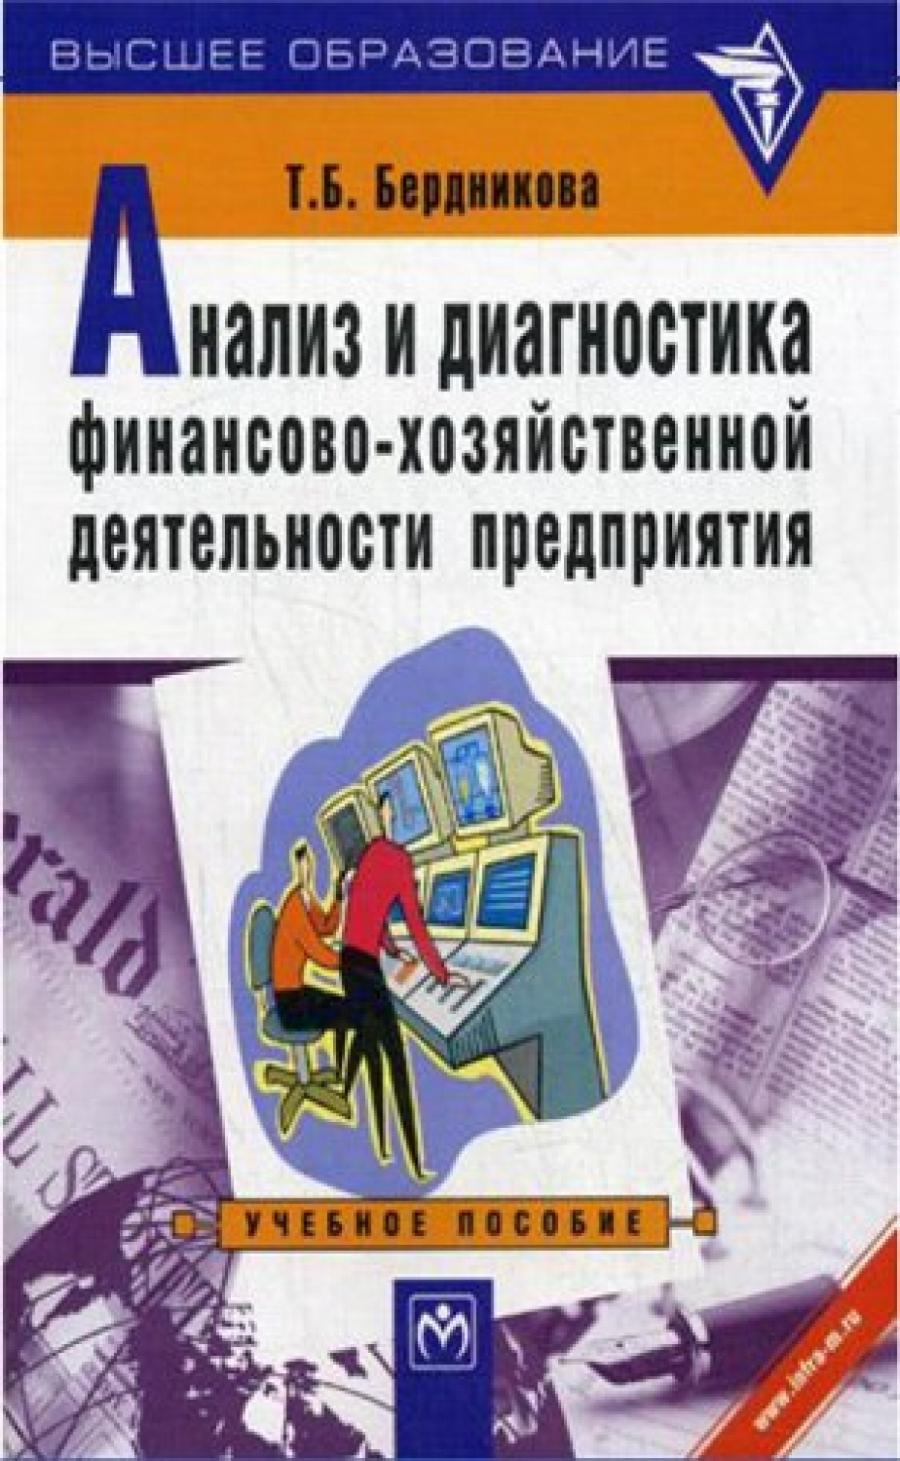 Обложка книги:  т.б. бердникова - анализ и диагностика финансово-хозяйственной деятельности предприятия